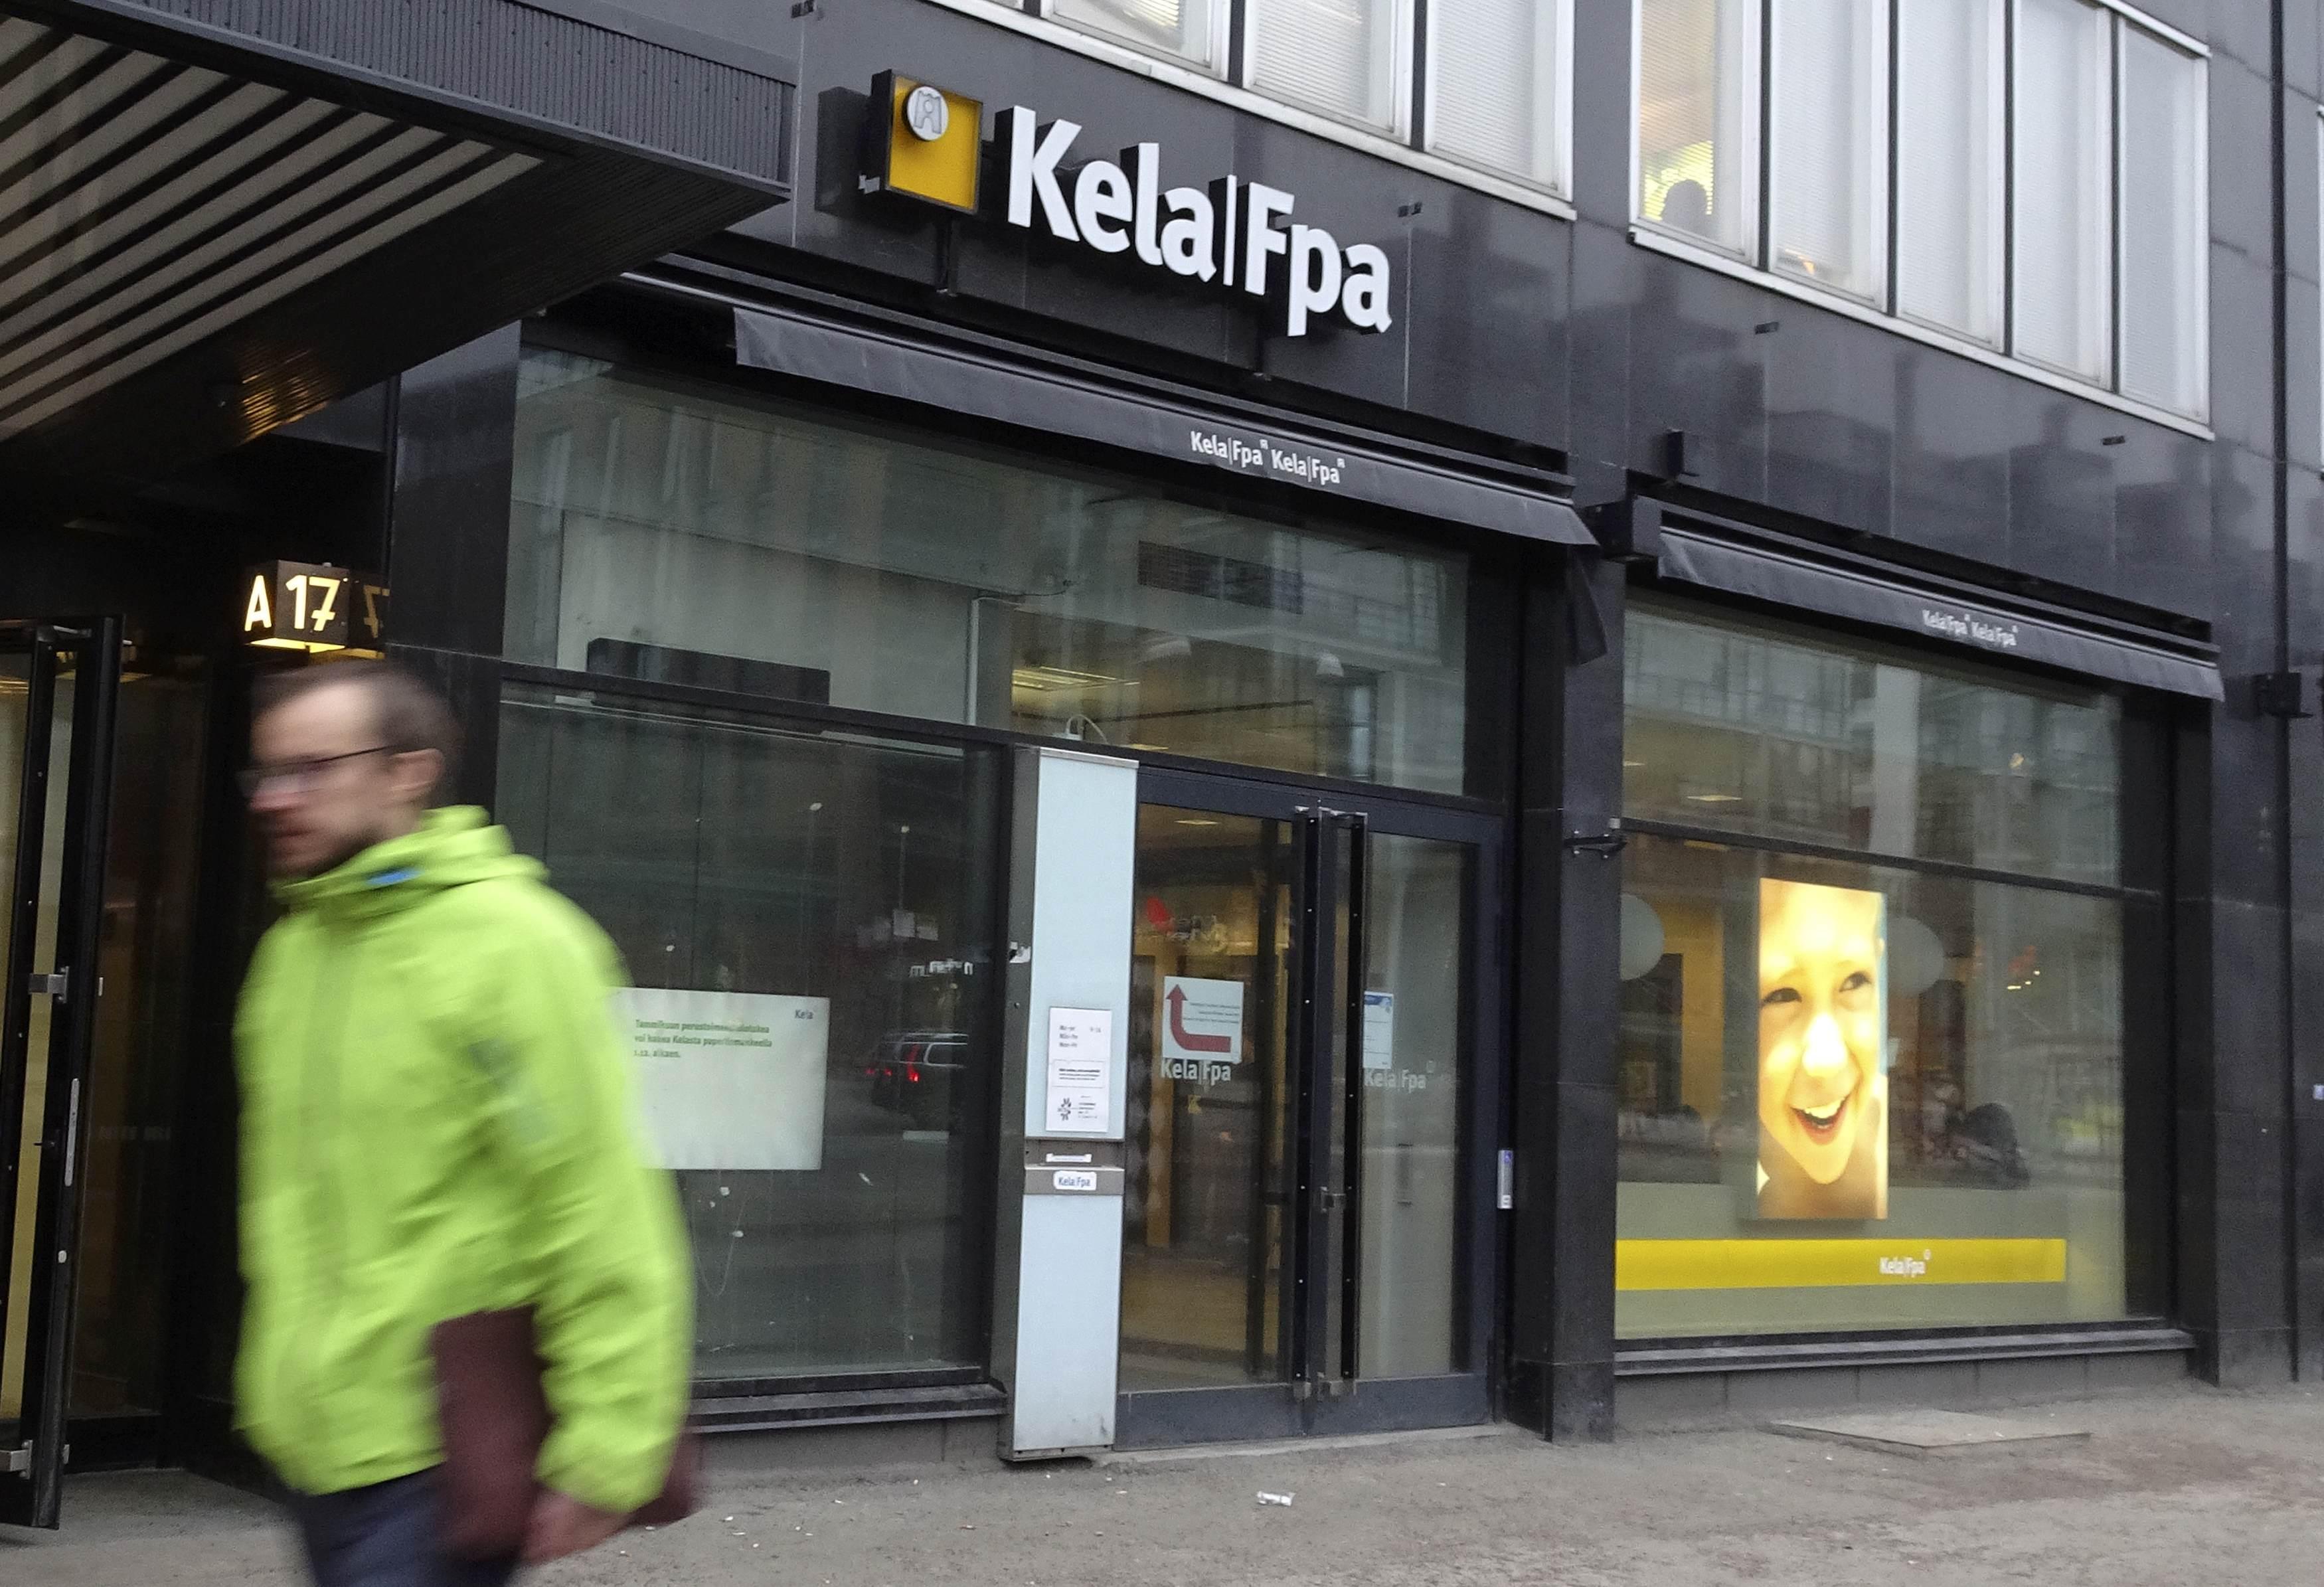 Finland pilots radical basic income idea despite feasibility doubts